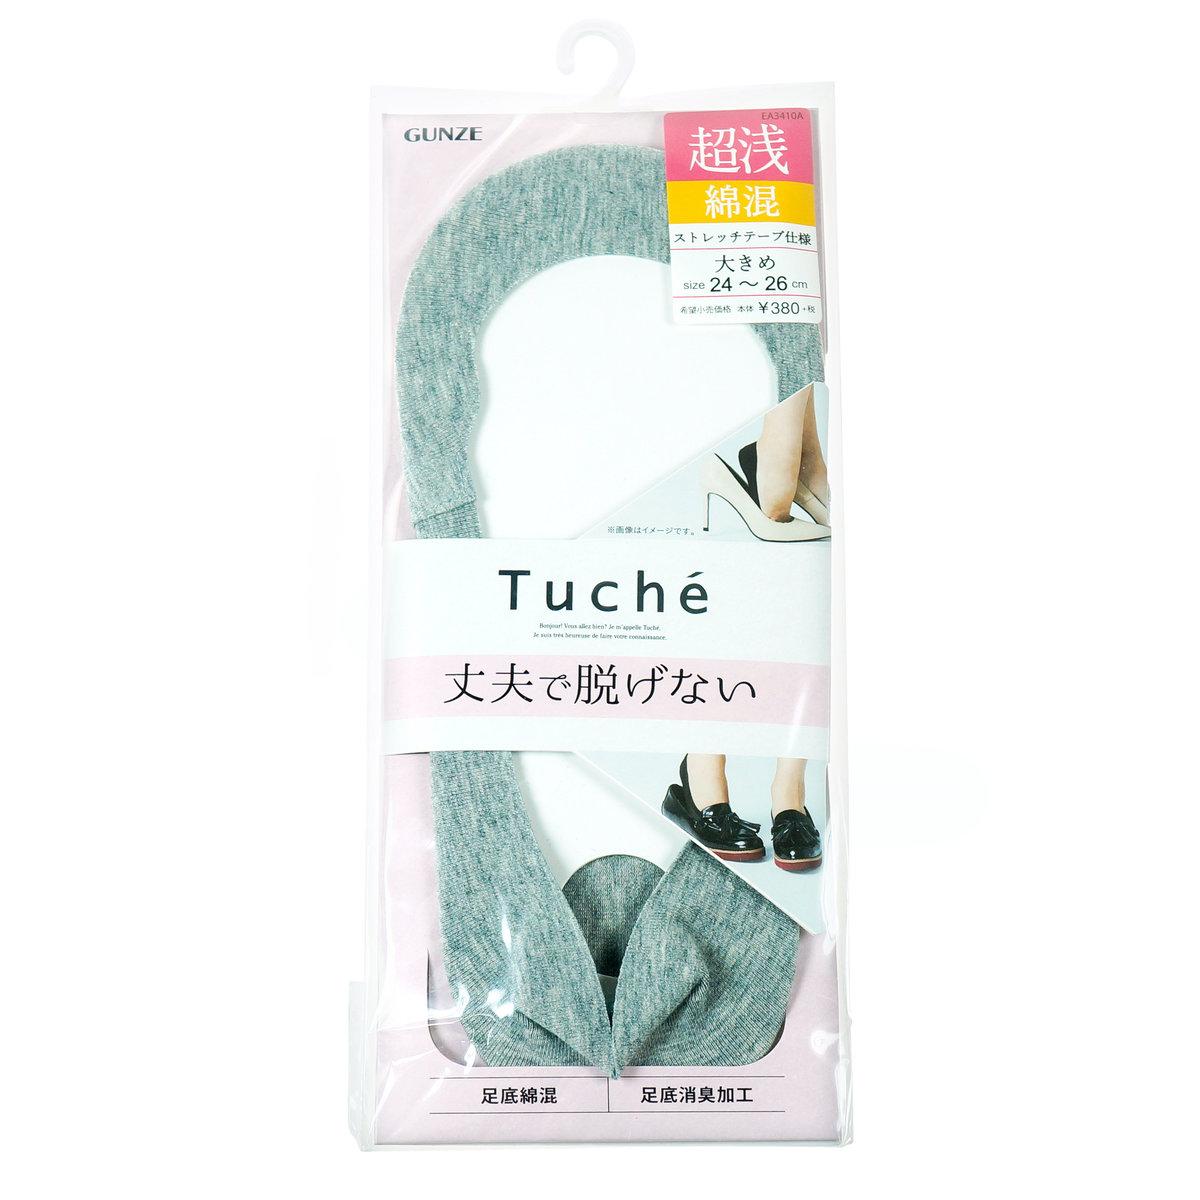 TUCHE TQK501 Anti-off Ultra Light Boat Socks Bare Jersey 774 Mock Grey, Size: 24-26 (23900)